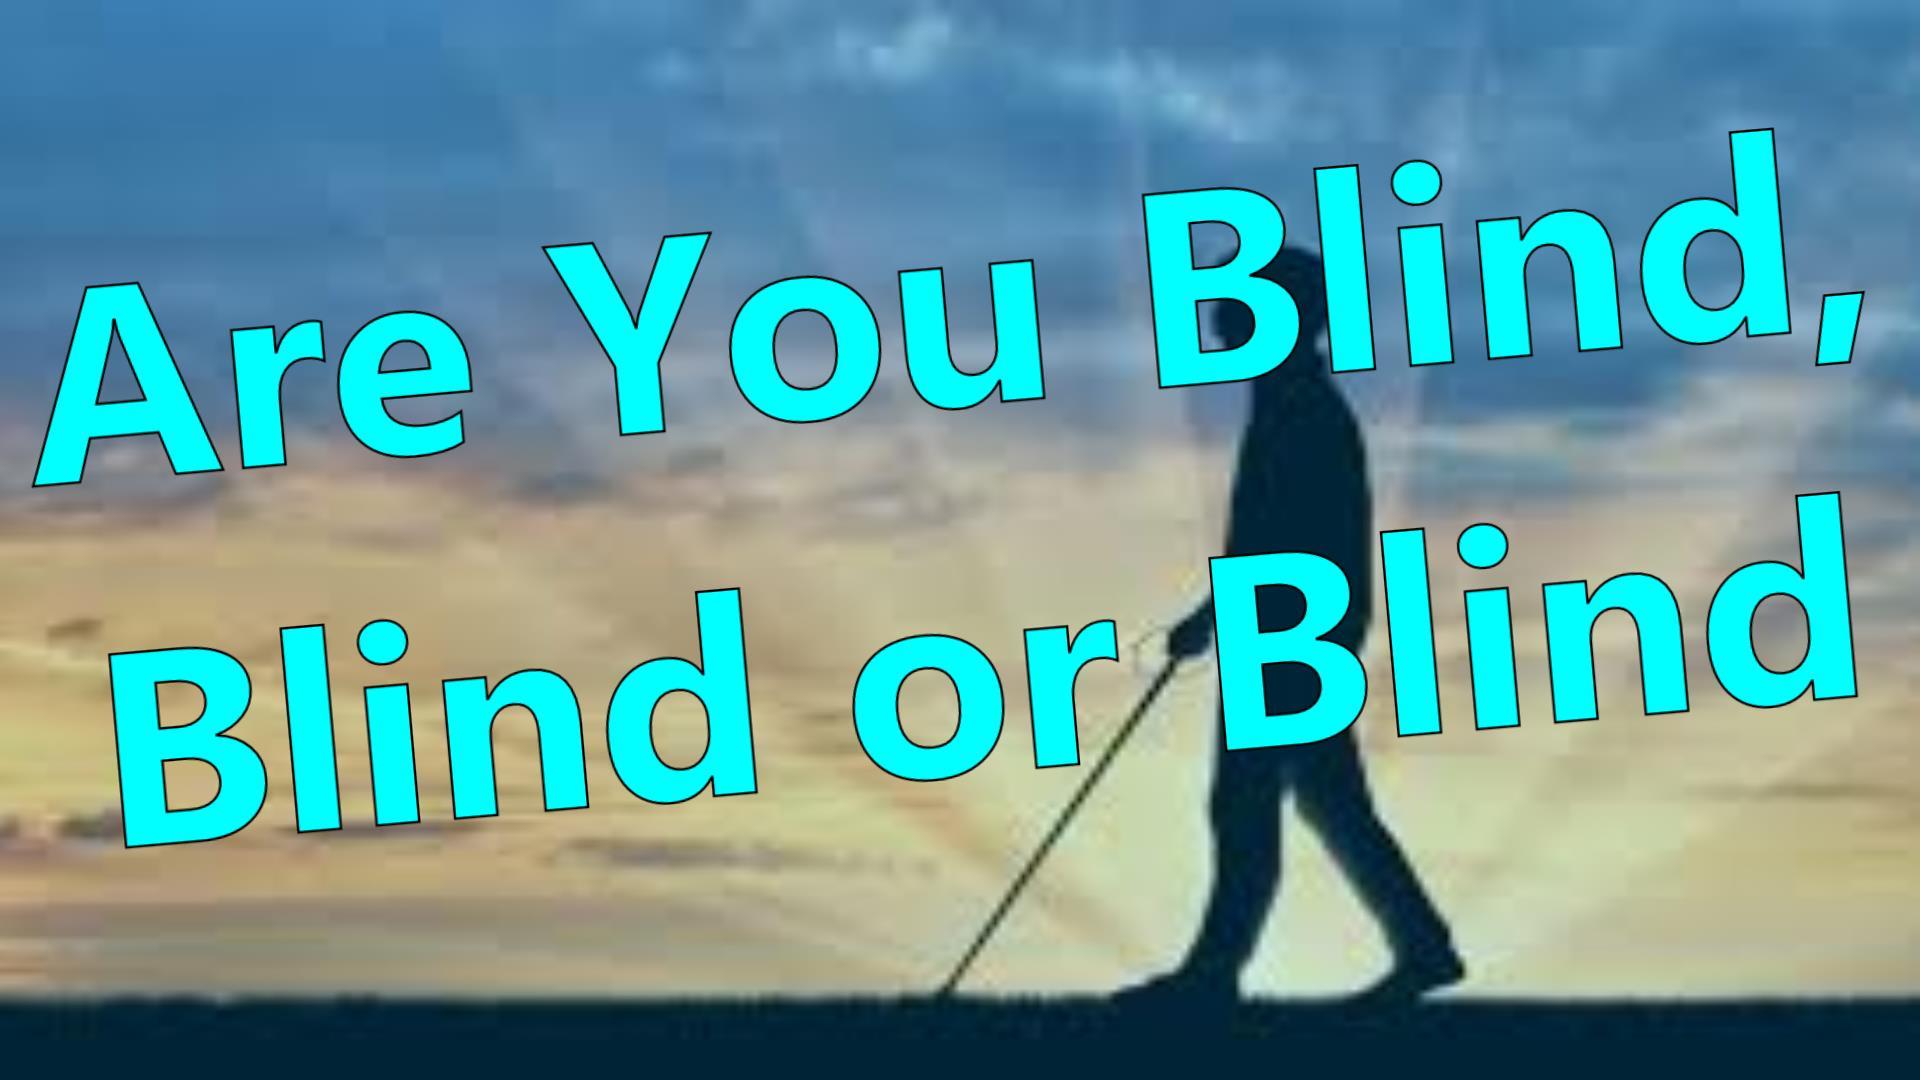 ARE YOU BLIND, BLIND, or  BLIND